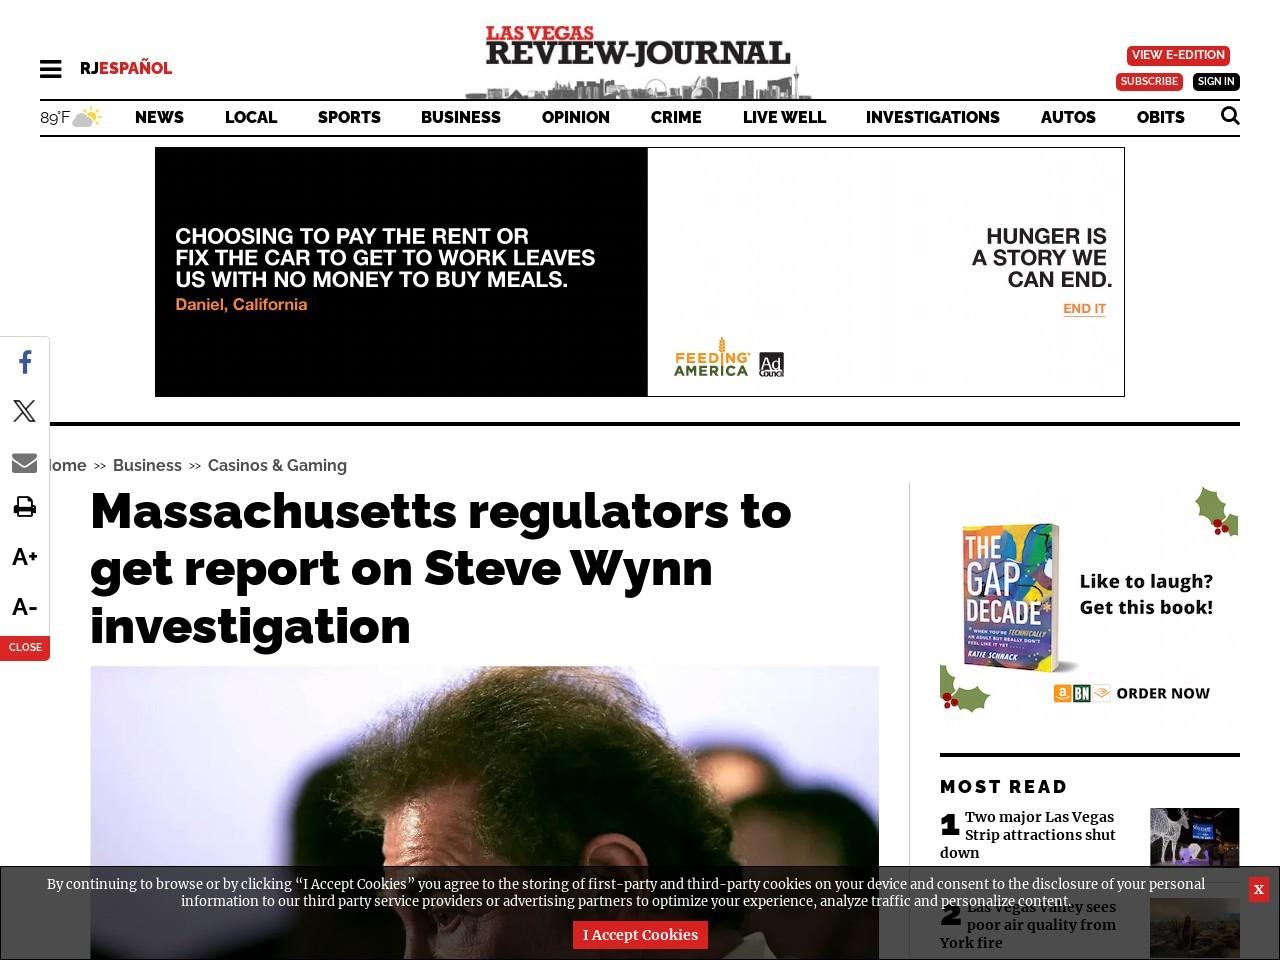 Massachusetts regulators to get report on Steve Wynn investigation